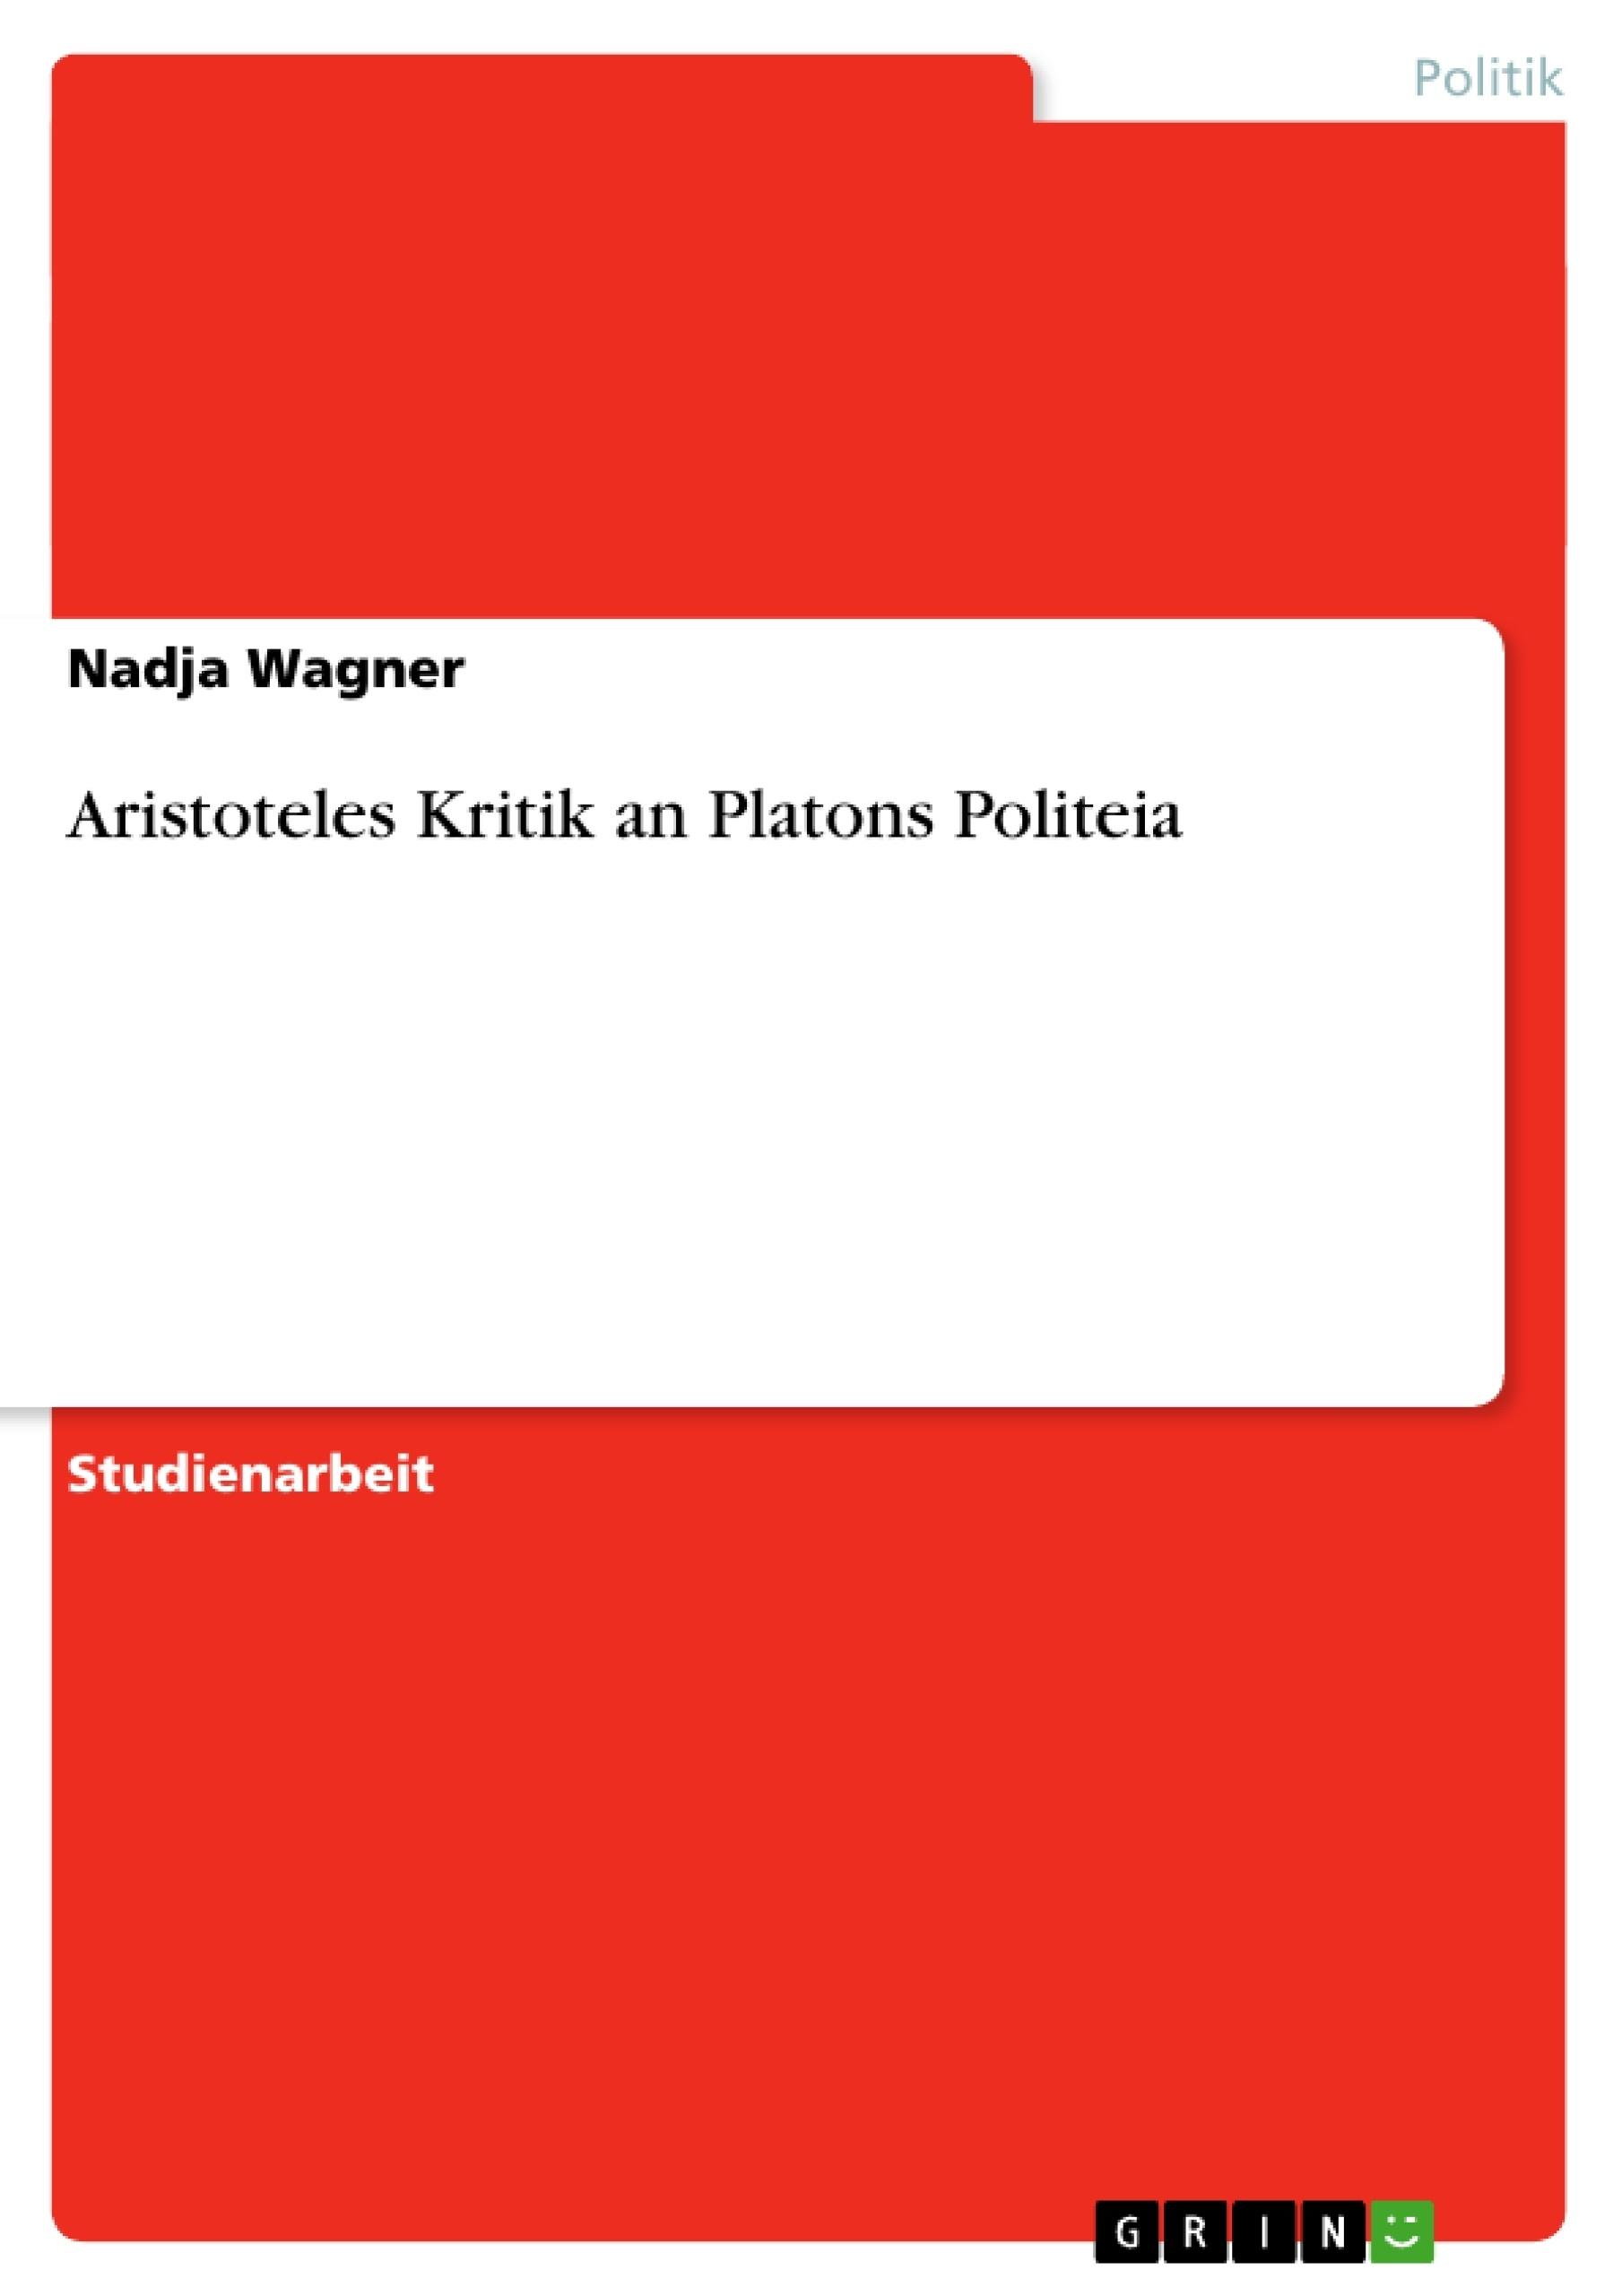 Titel: Aristoteles Kritik an Platons Politeia